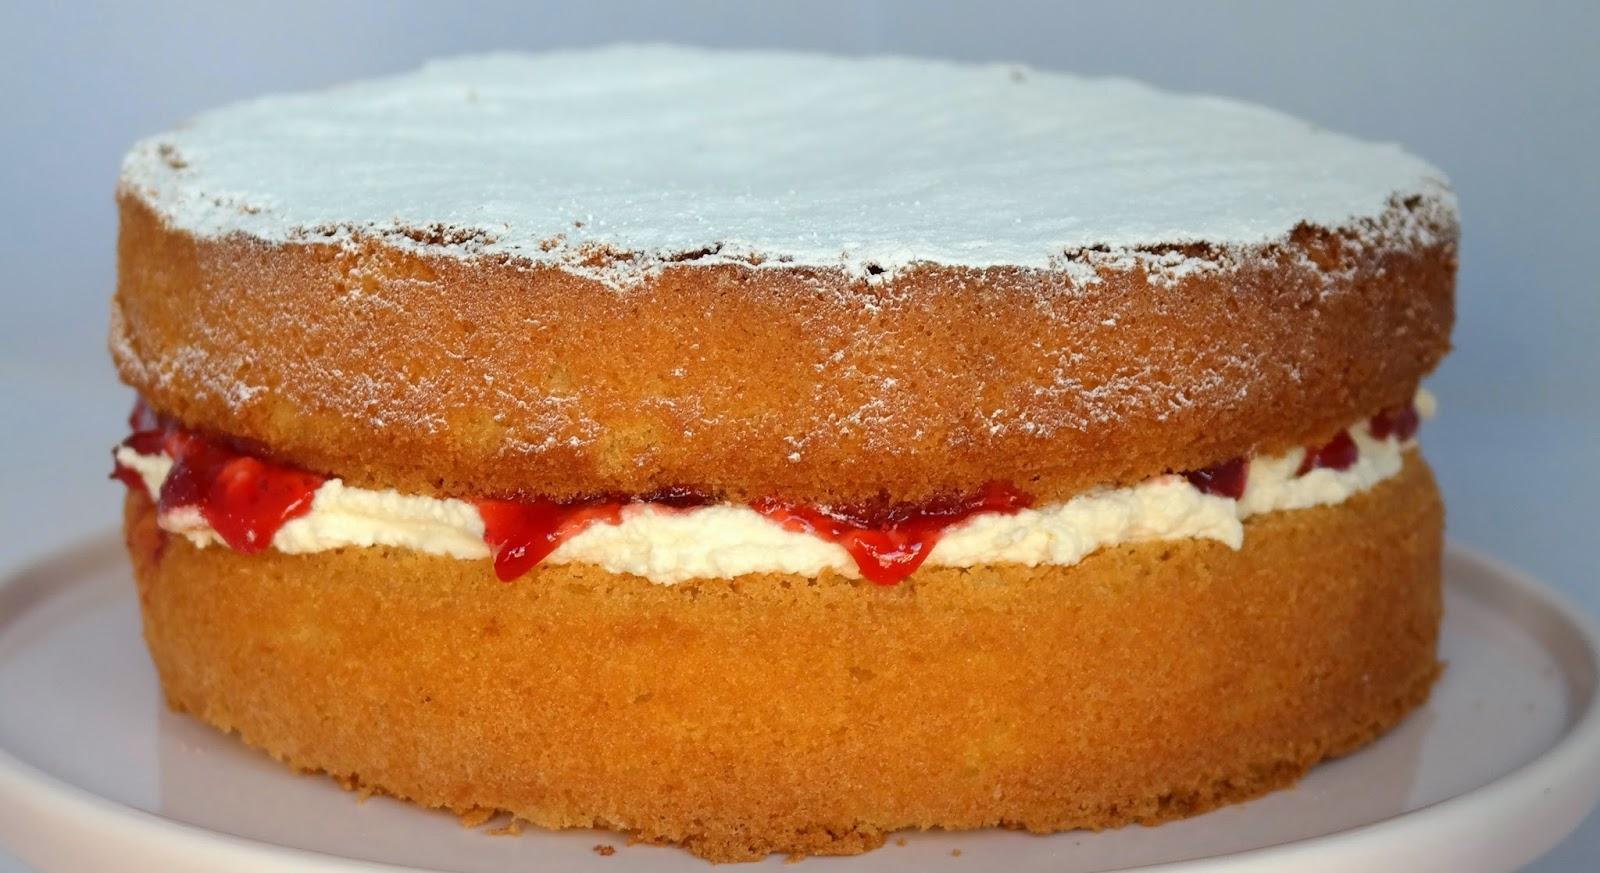 Best Sponge Cake Recipes Uk: Classic Victoria Sponge